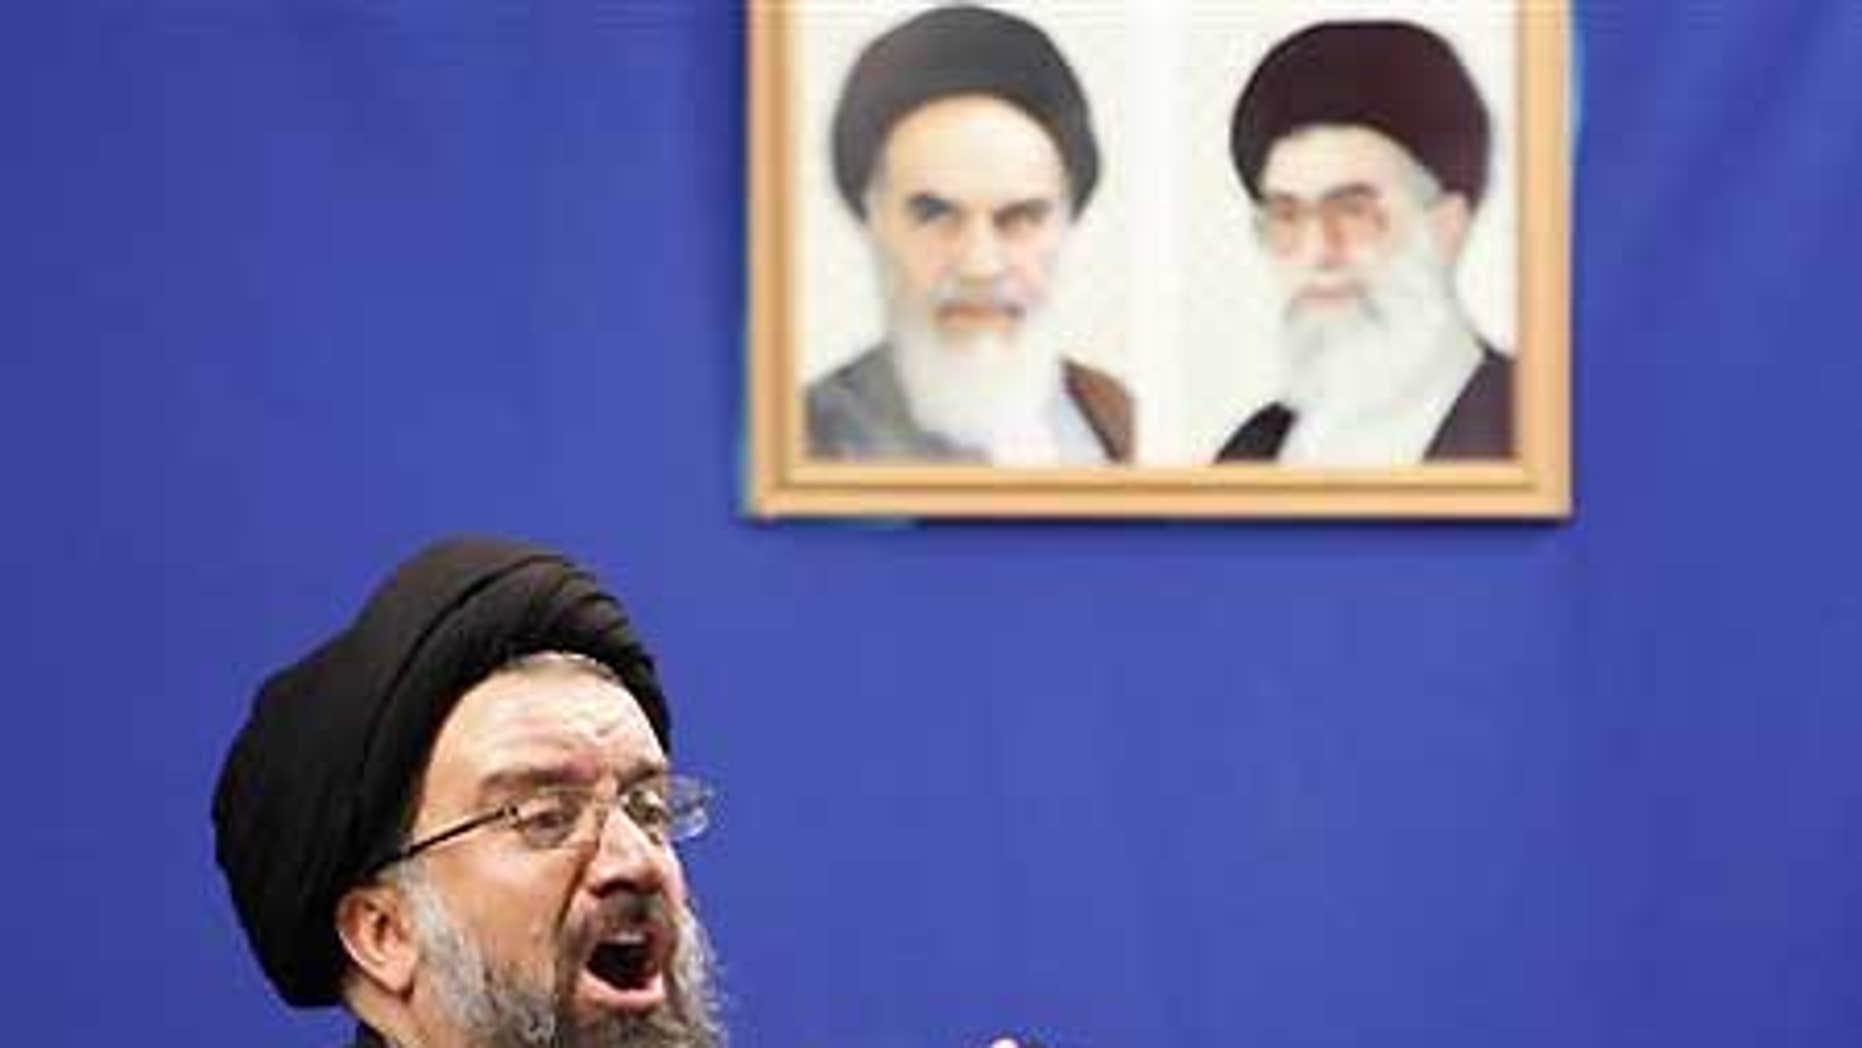 Friday June 26: Iranian senior hard-line cleric Ayatollah Ahmad Khatami urged government to punish post-election rioters during Friday prayers.